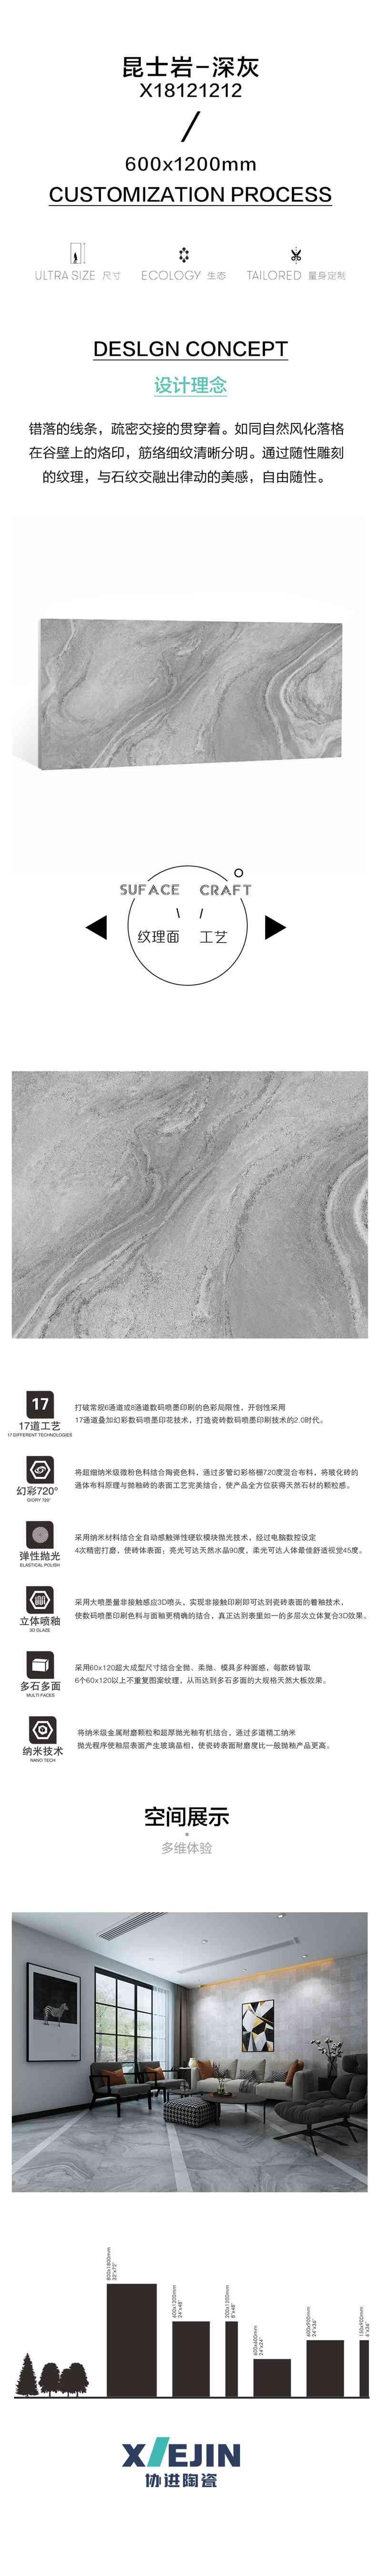 X18121212--19.jpg